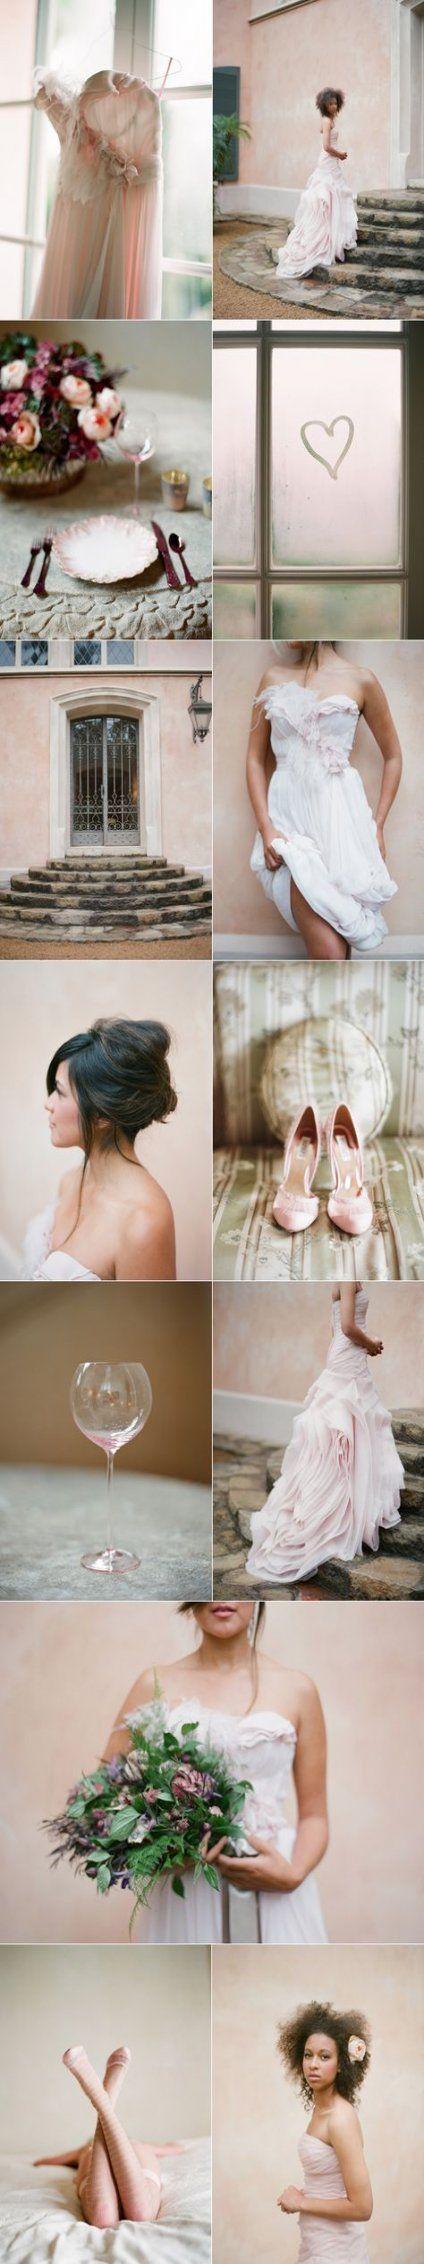 Wedding Photography Dress Blush Pink 33+ Ideas